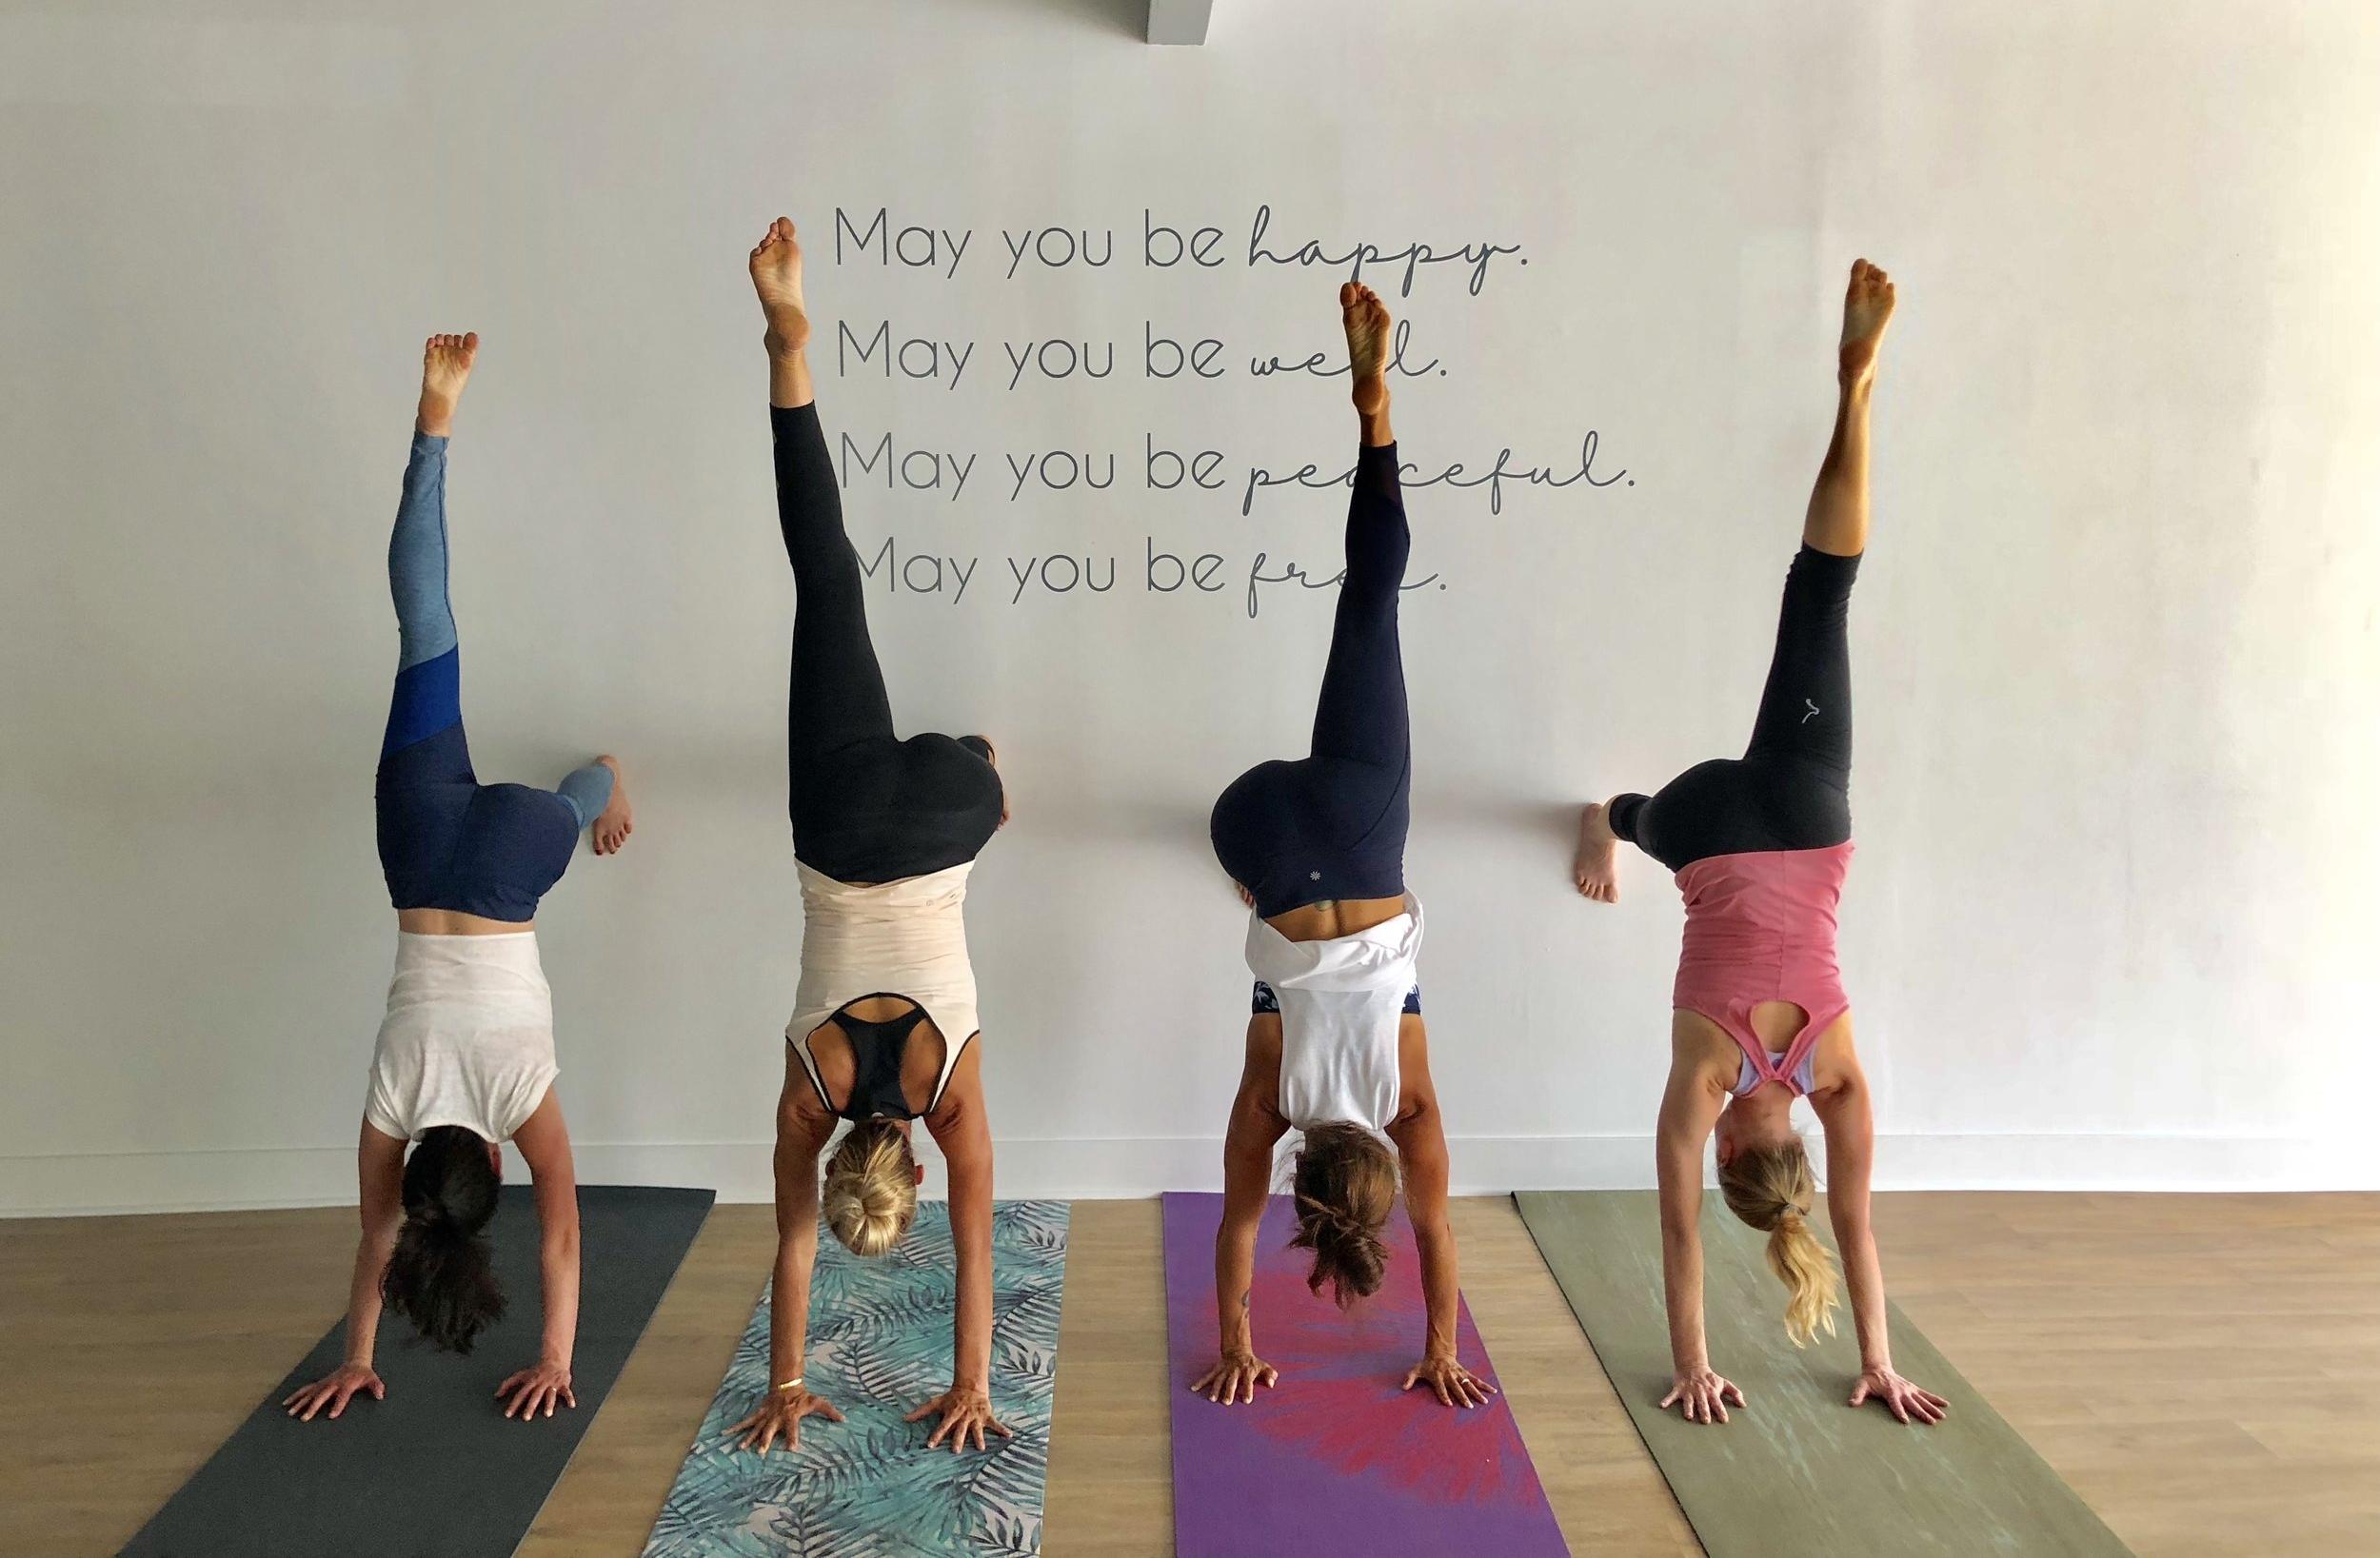 metta prayer handstands